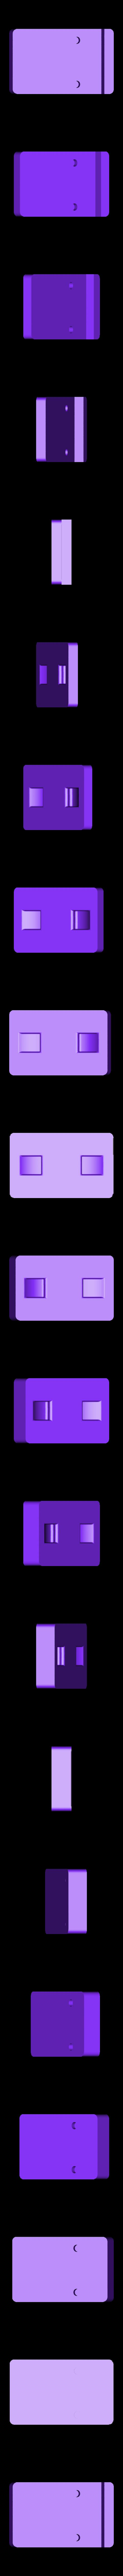 lid.stl Download free STL file Nail Puzzle Box - 3D Print • Model to 3D print, mtairymd